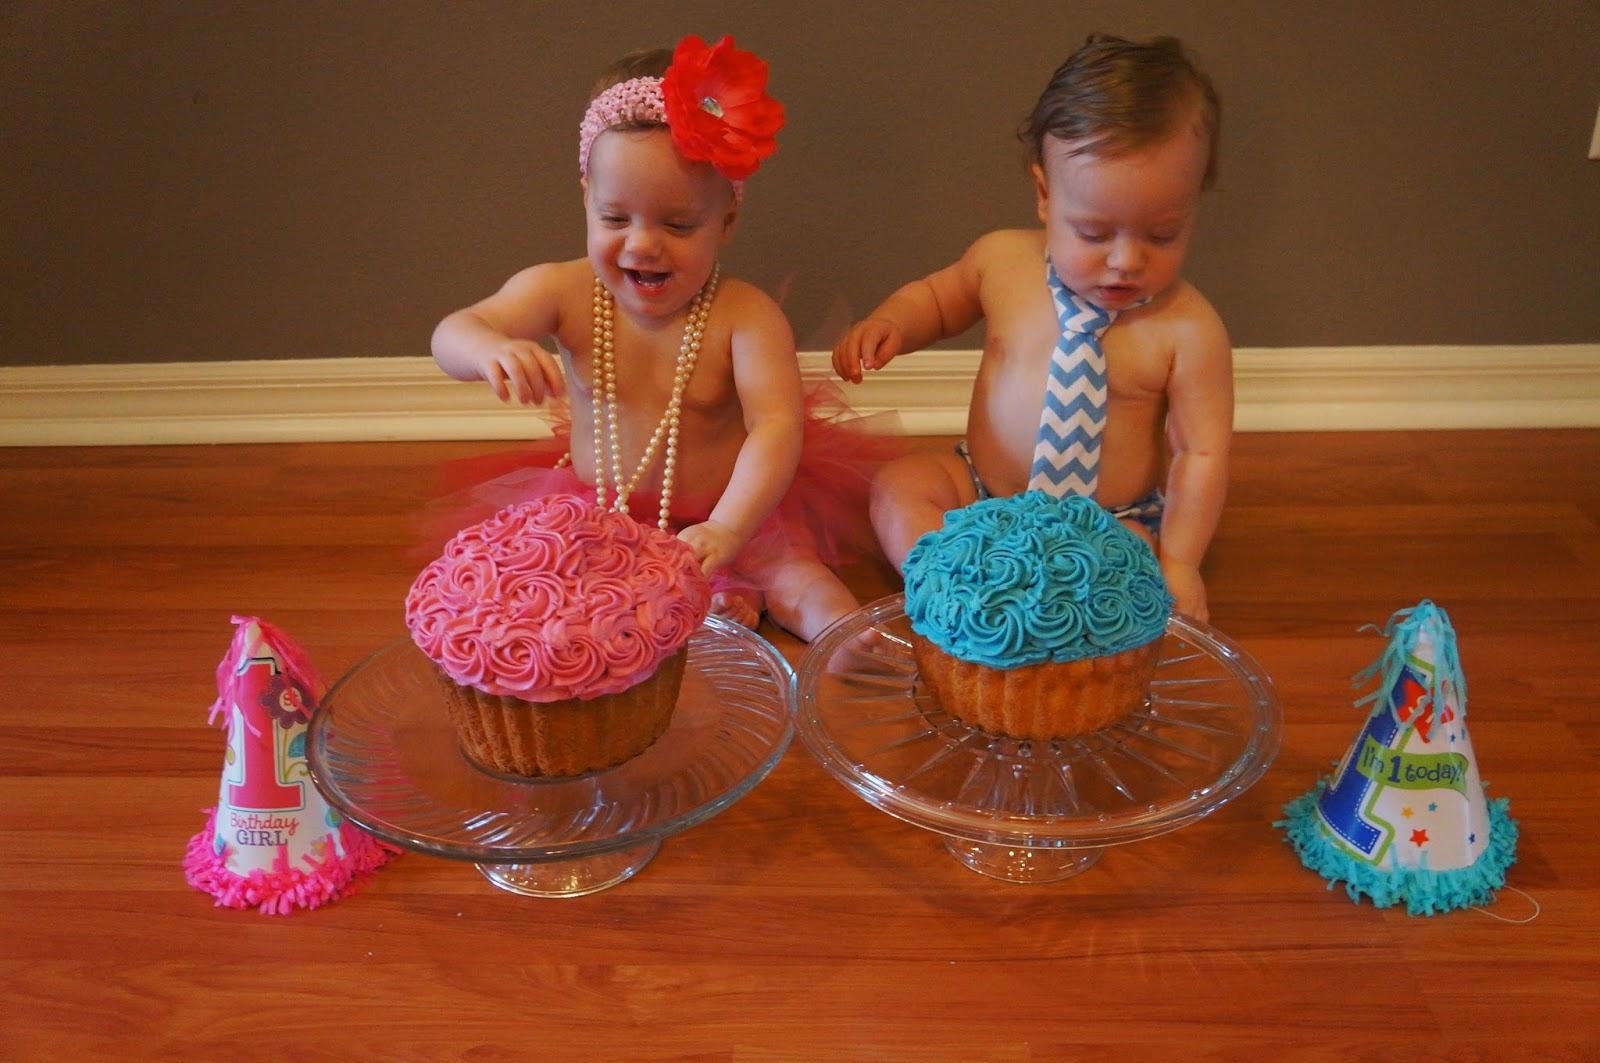 My Twinspirational Journey The Twins 1st Birthday Cake Smash Photo